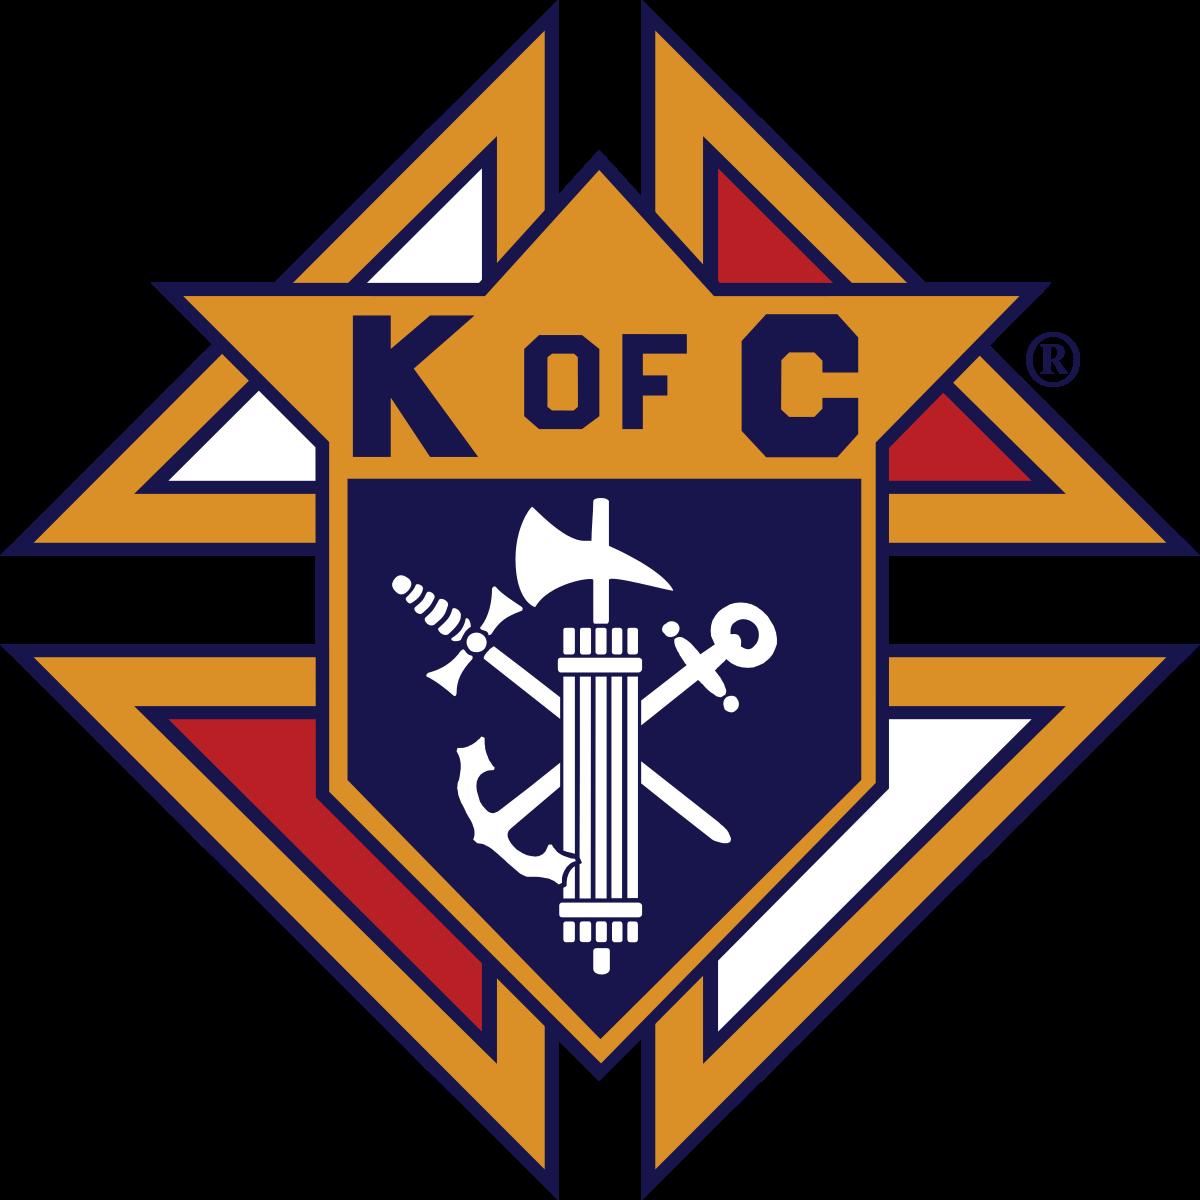 Floridak Ofc logo